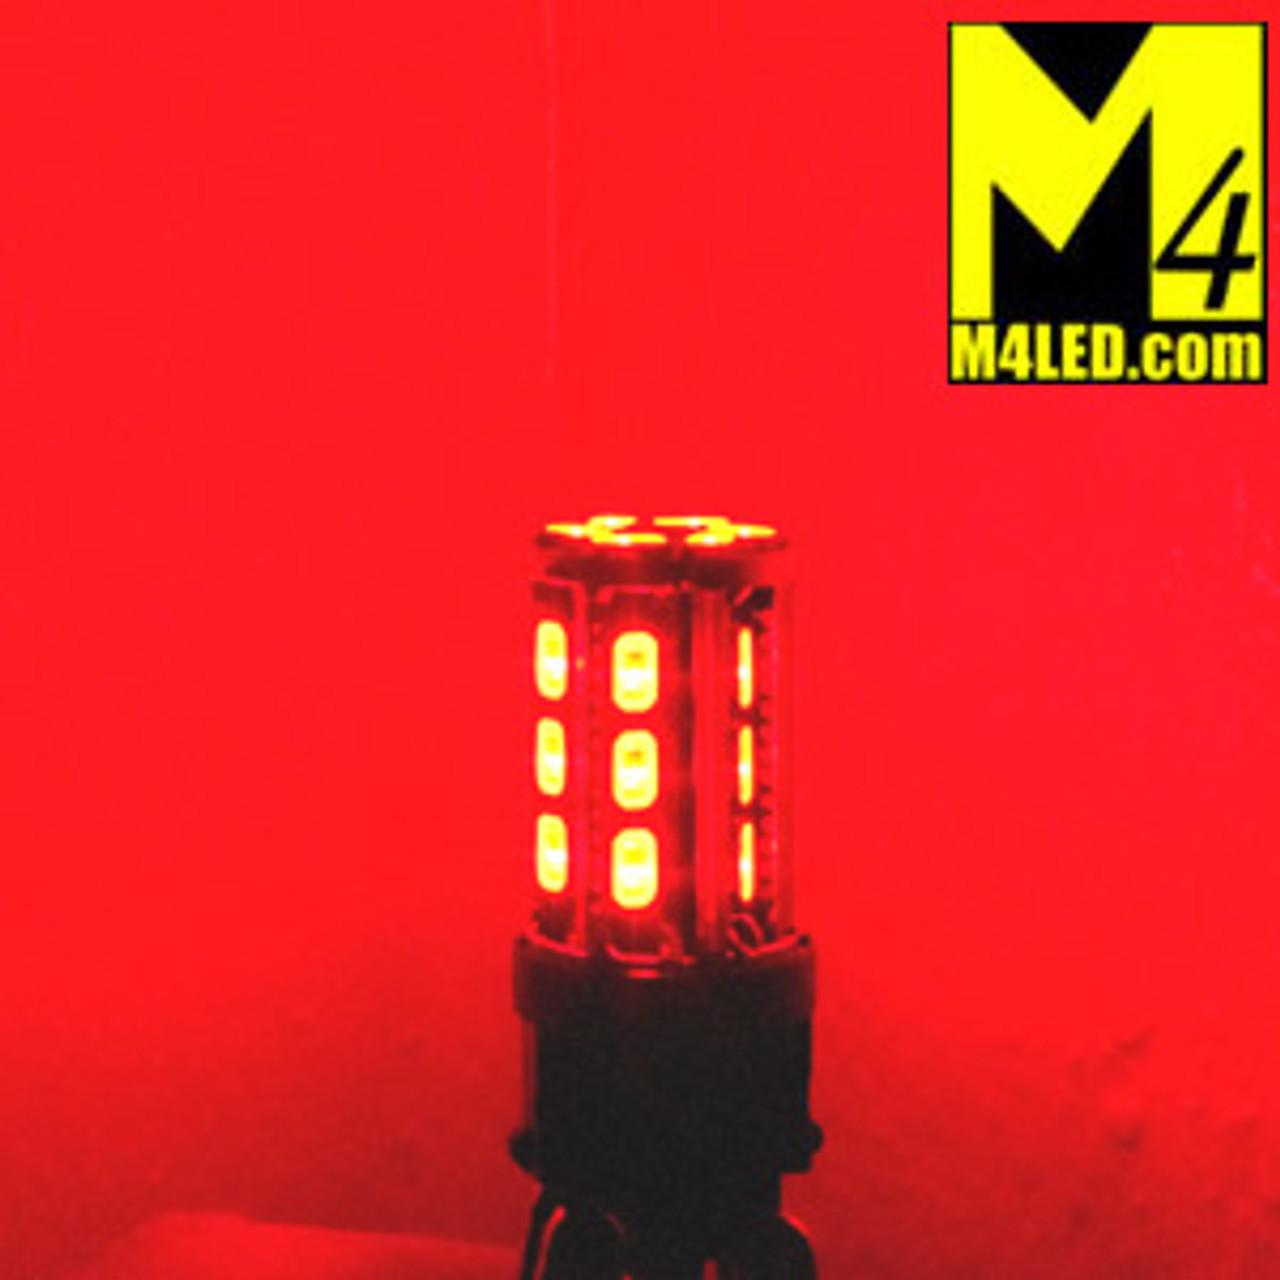 3157-24-5630-RED 3157 Red Tail Light Replacement, Brake/Tail (Hi/Low)